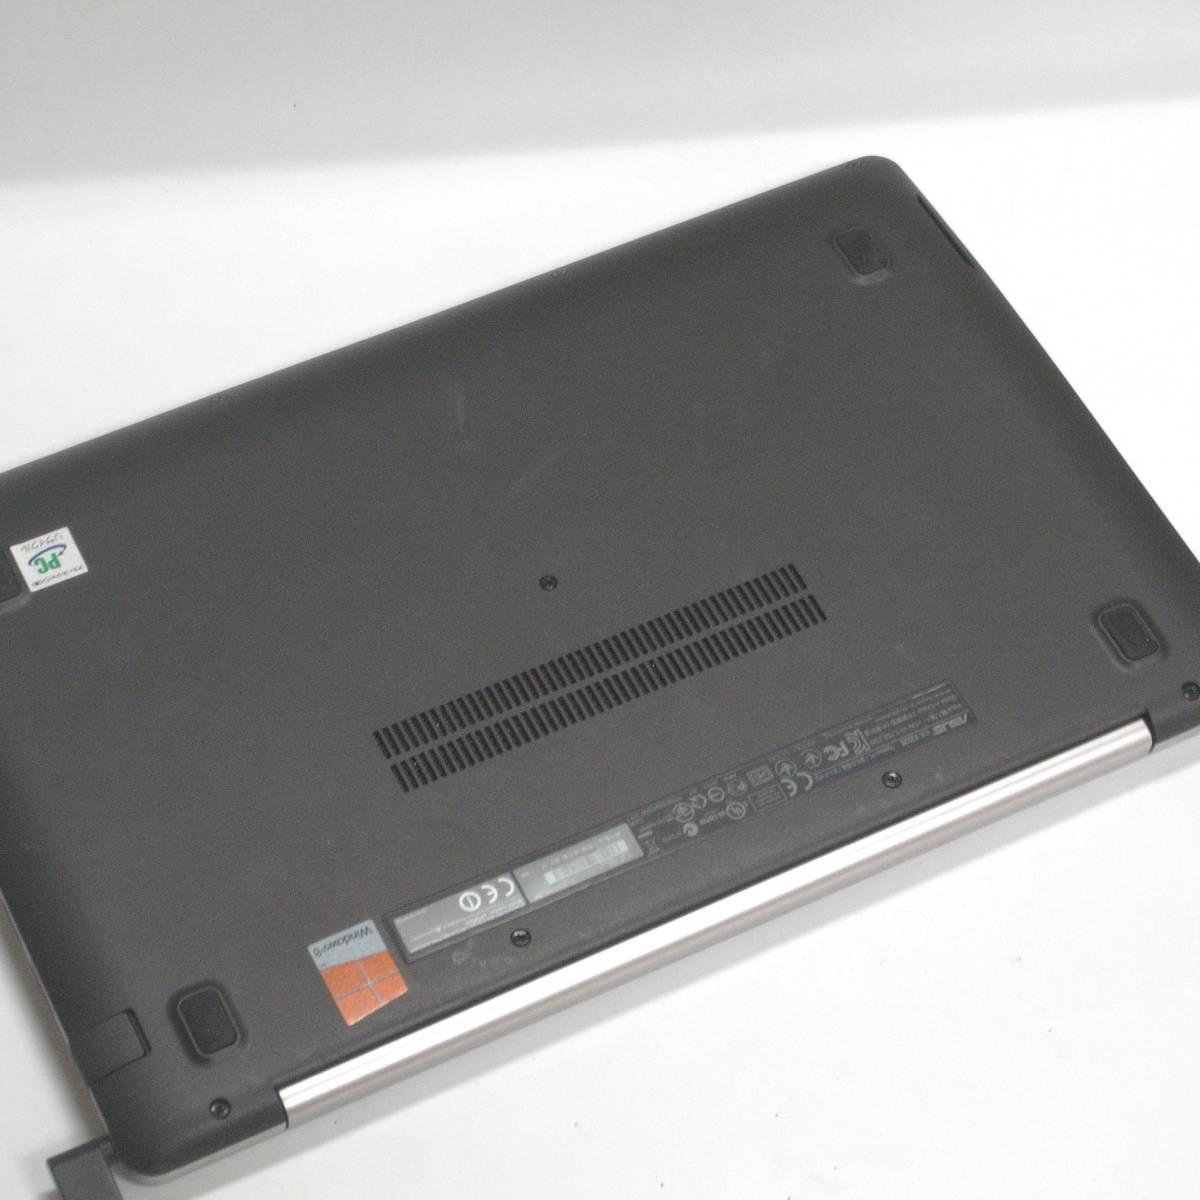 ASUS VivoBook X202E 送料無料 Core i3 1.8GHz 11インチタッチパネル液晶 メモリ4GB HDD500GB WIN10 #2_画像5